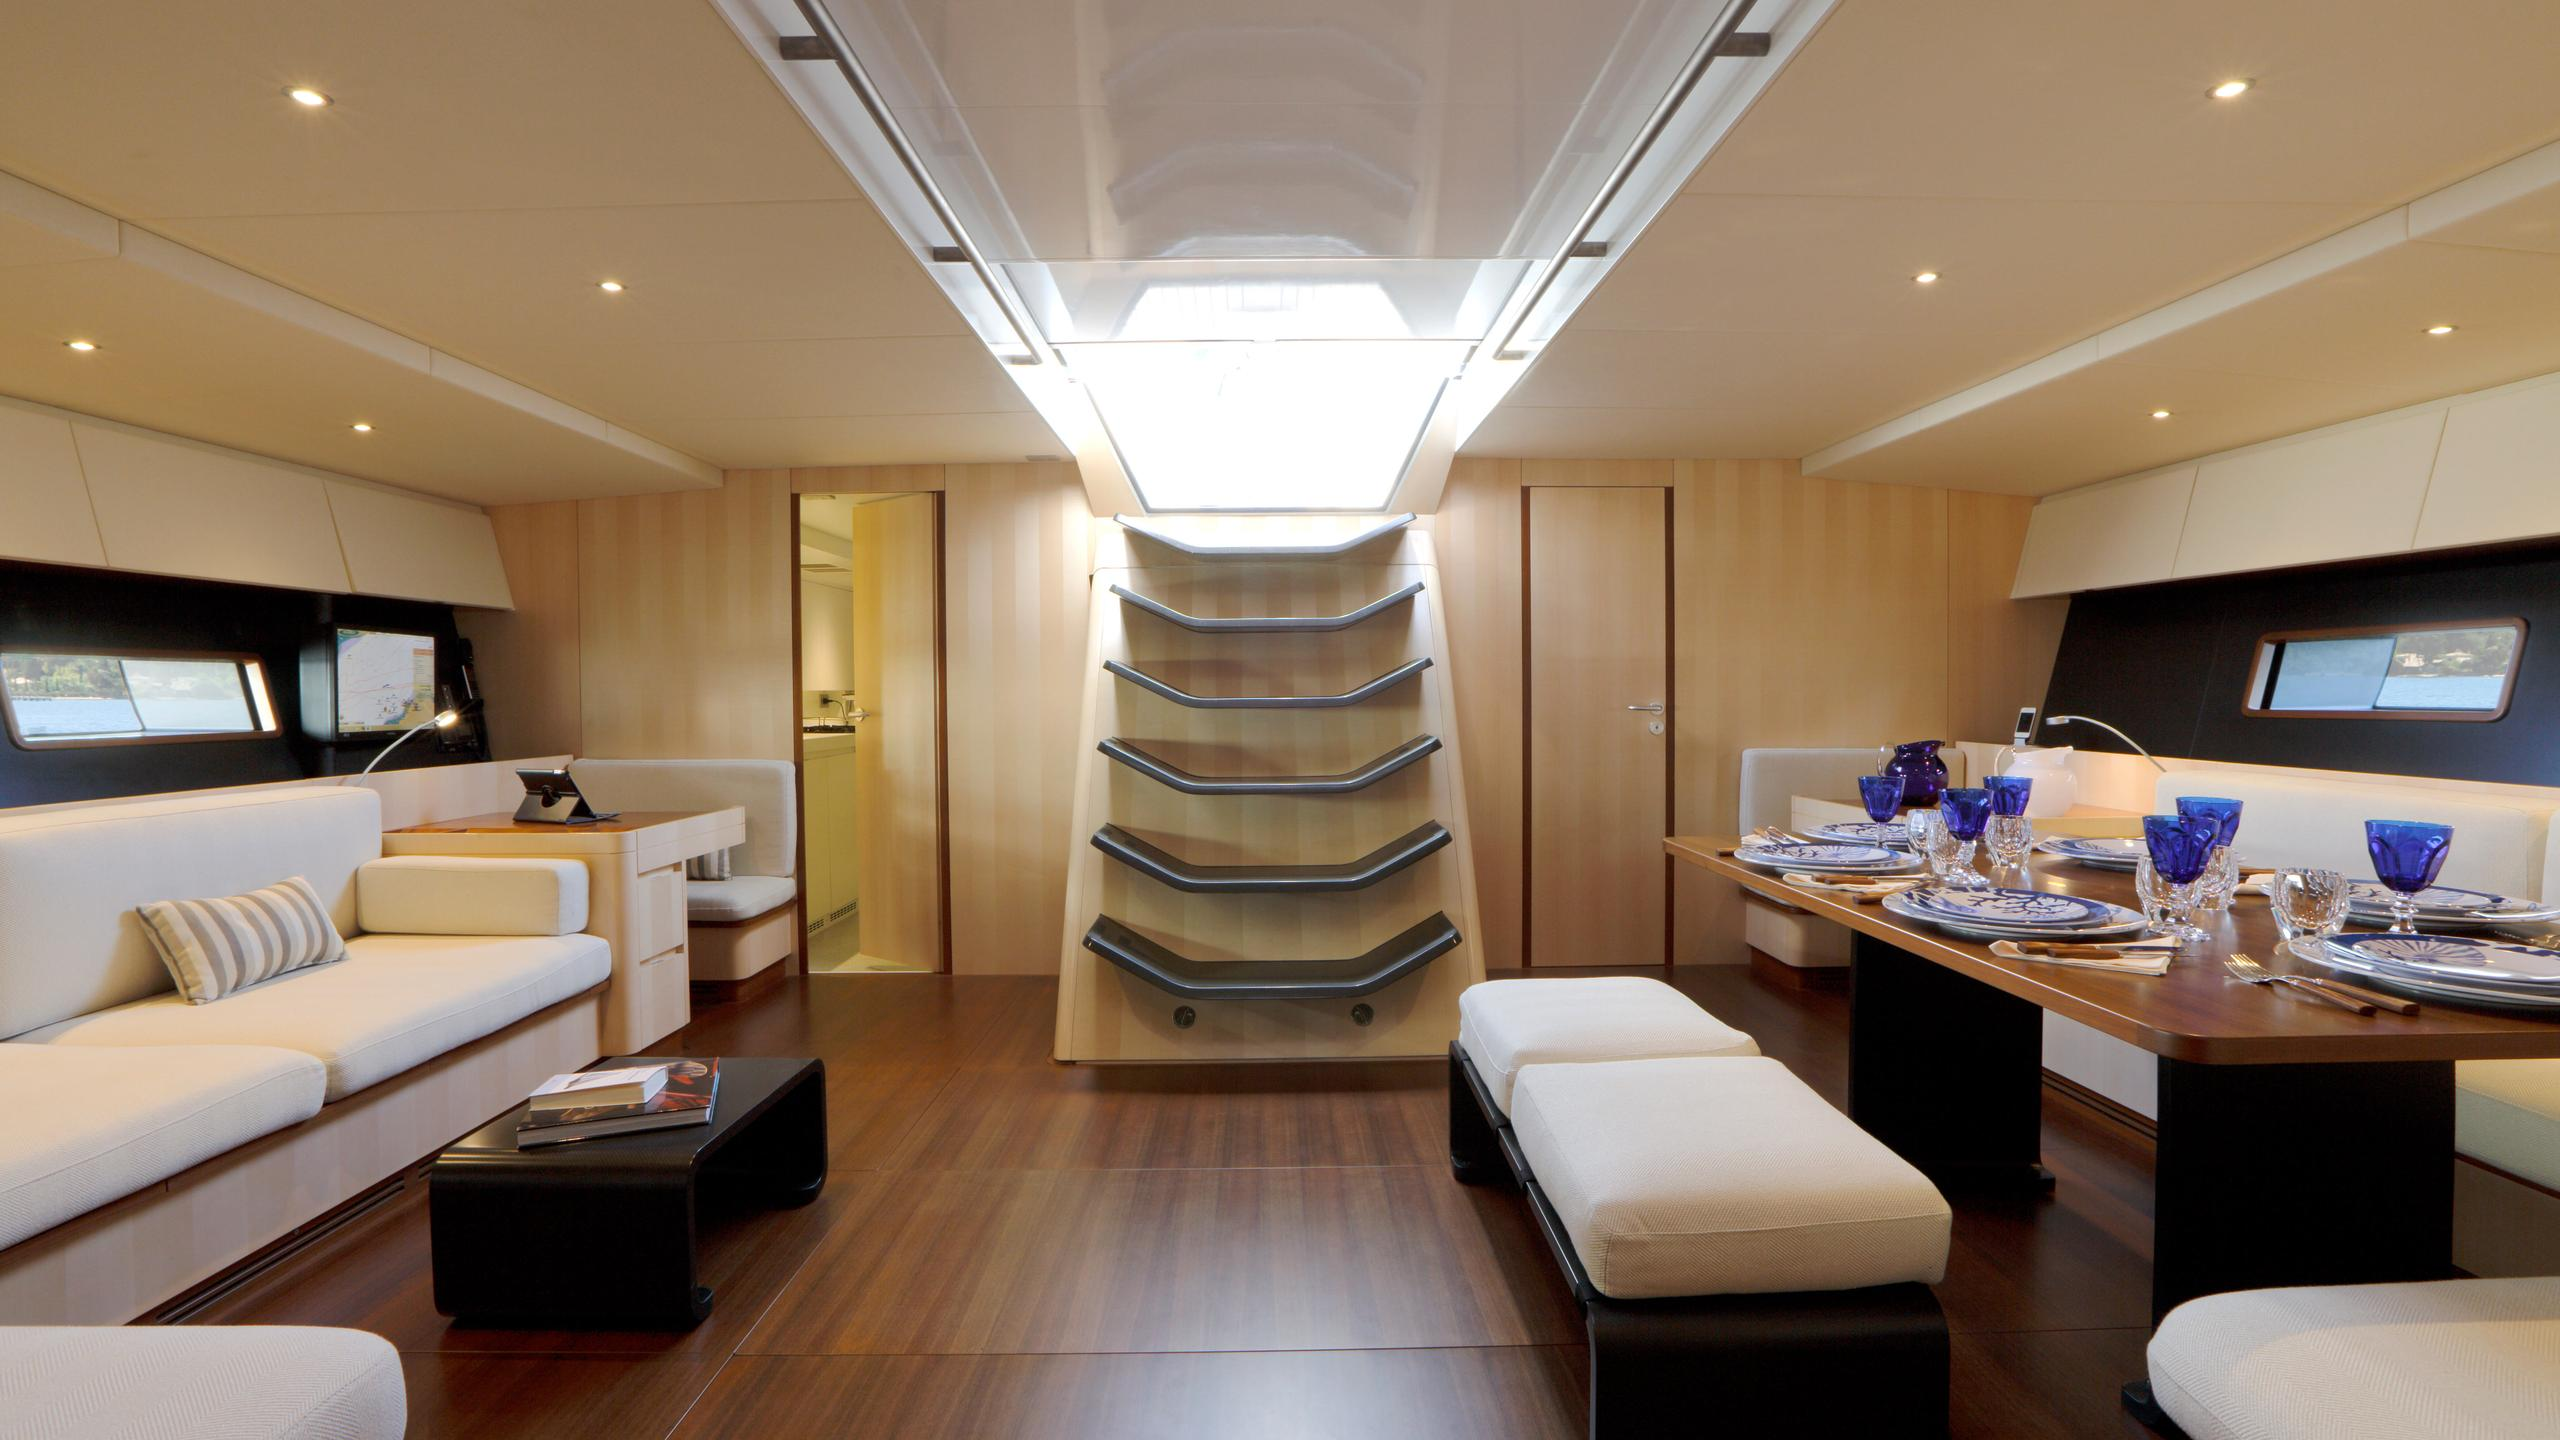 Magic-Carpet-iii-sailing-yacht-wally-21013-30m-stairs